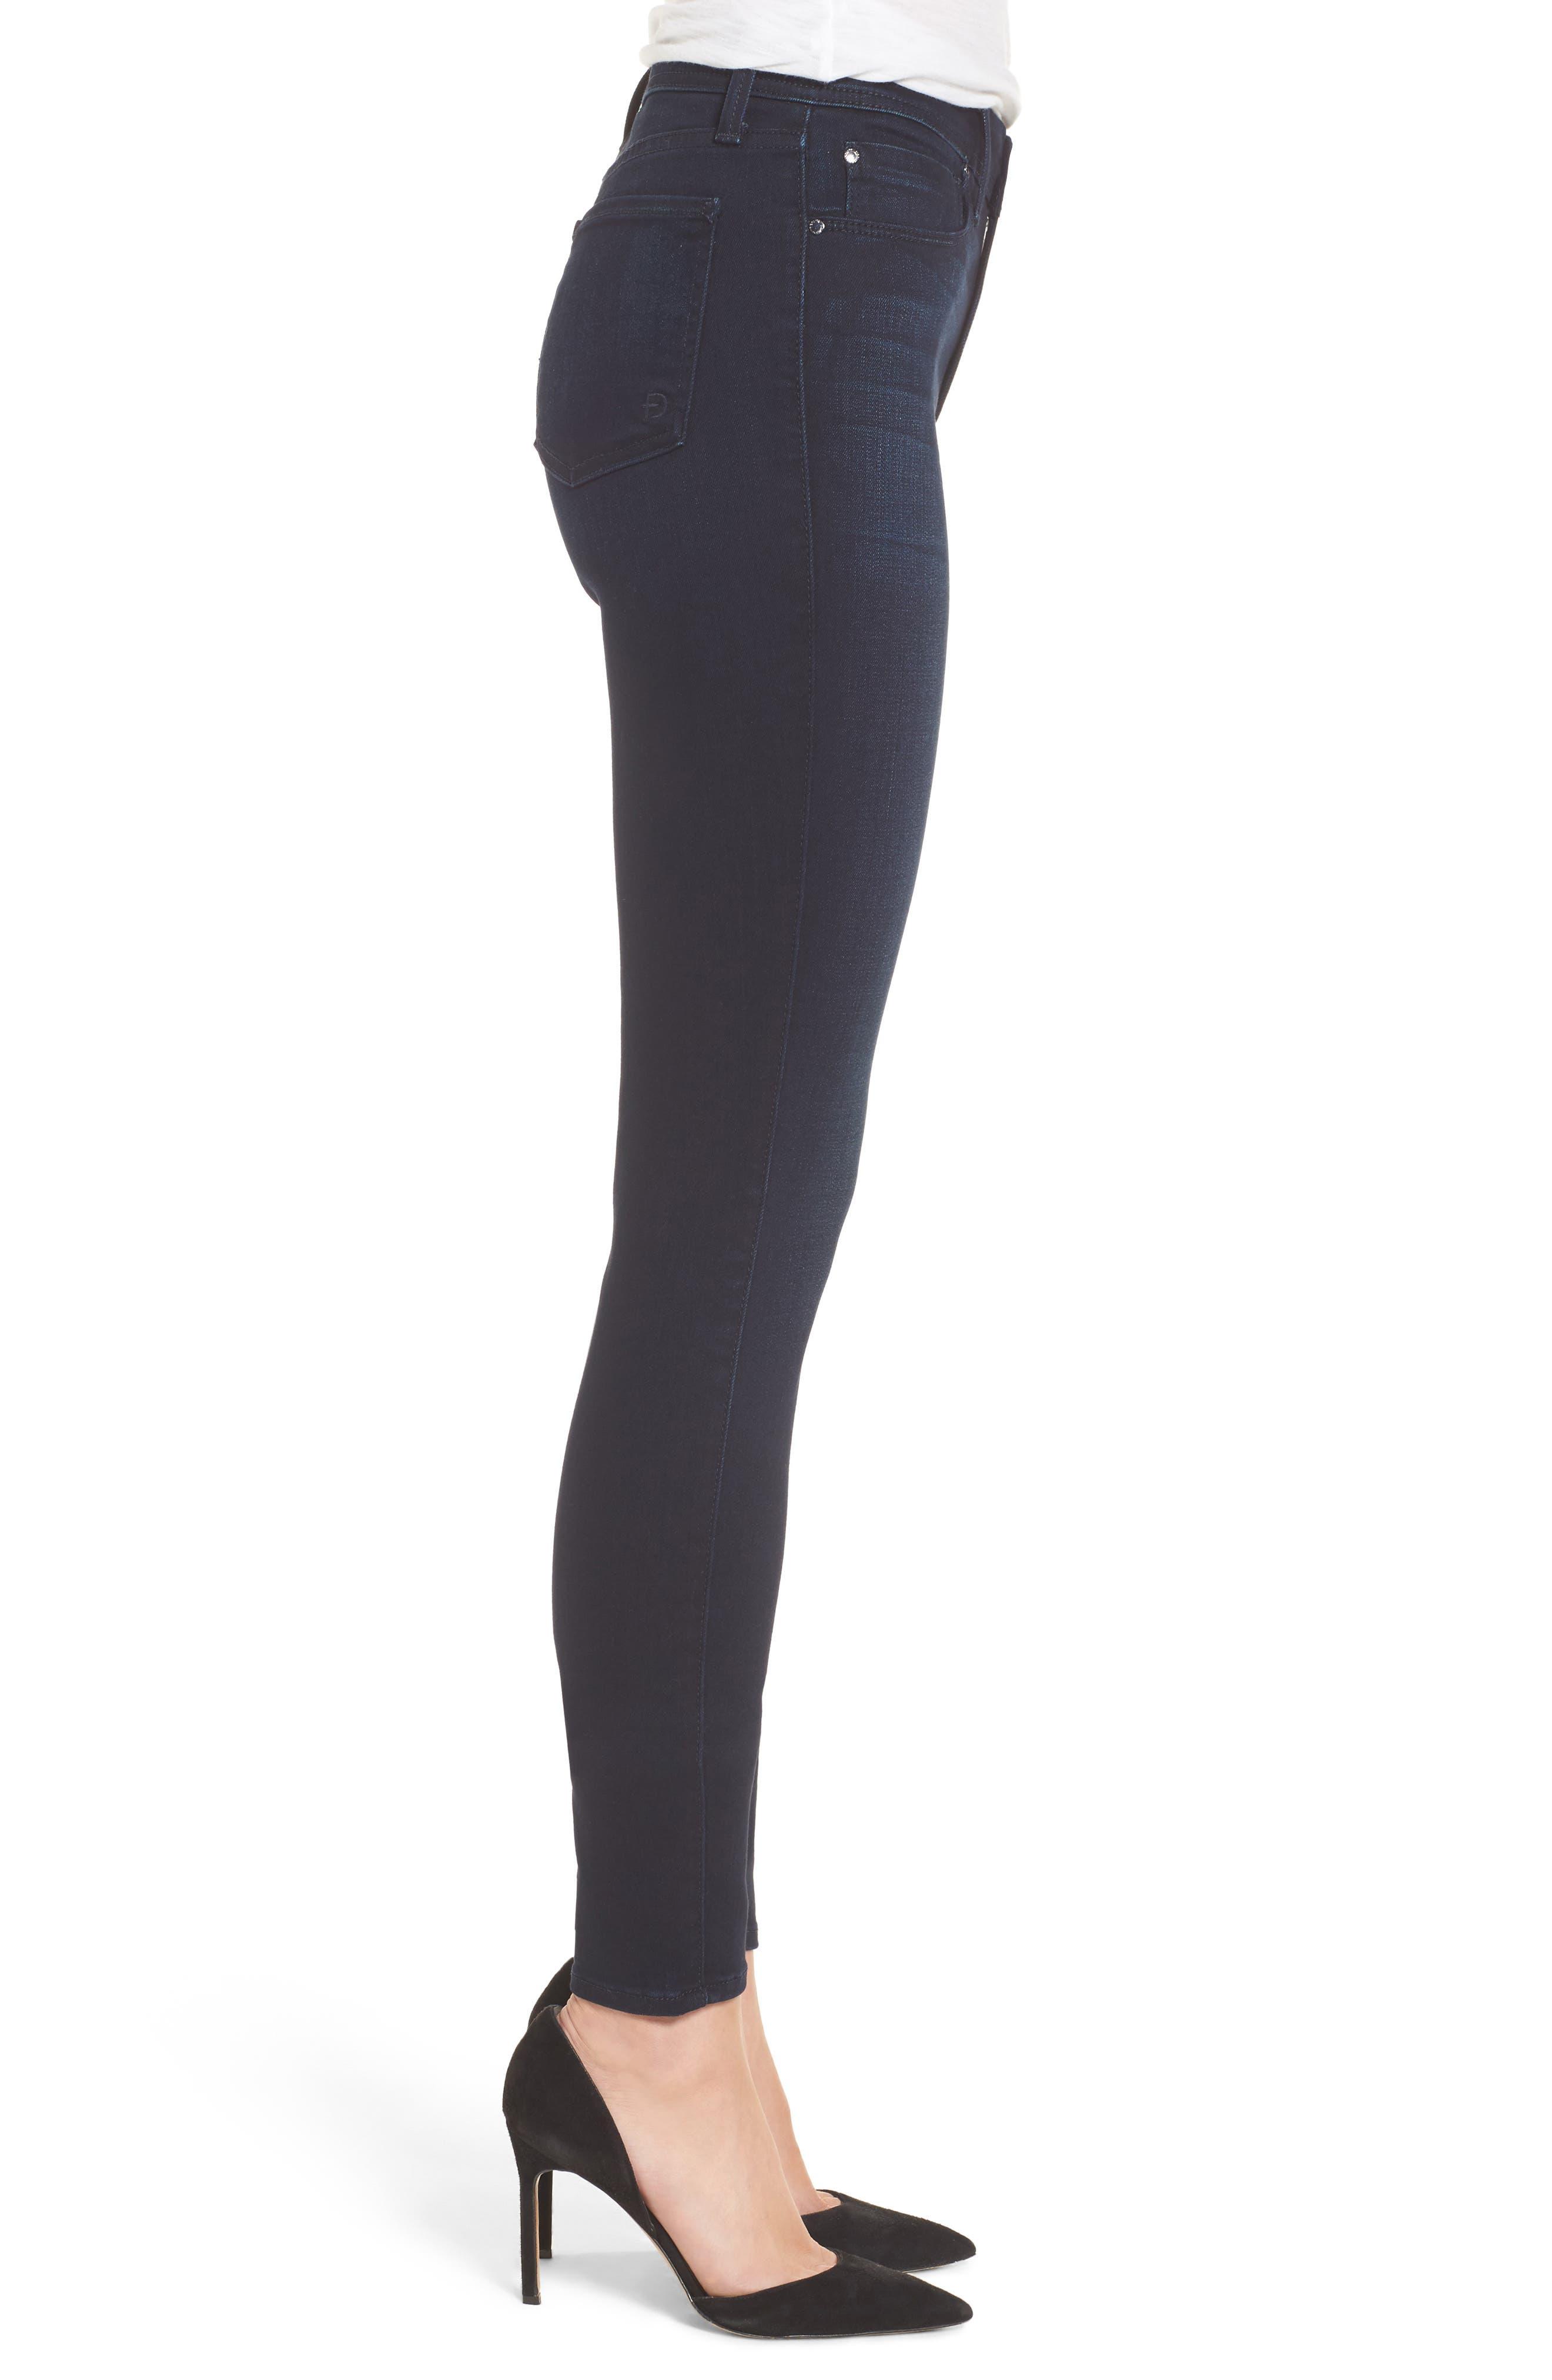 Fidelity Jeans Belvedere Skinny Jeans,                             Alternate thumbnail 3, color,                             400